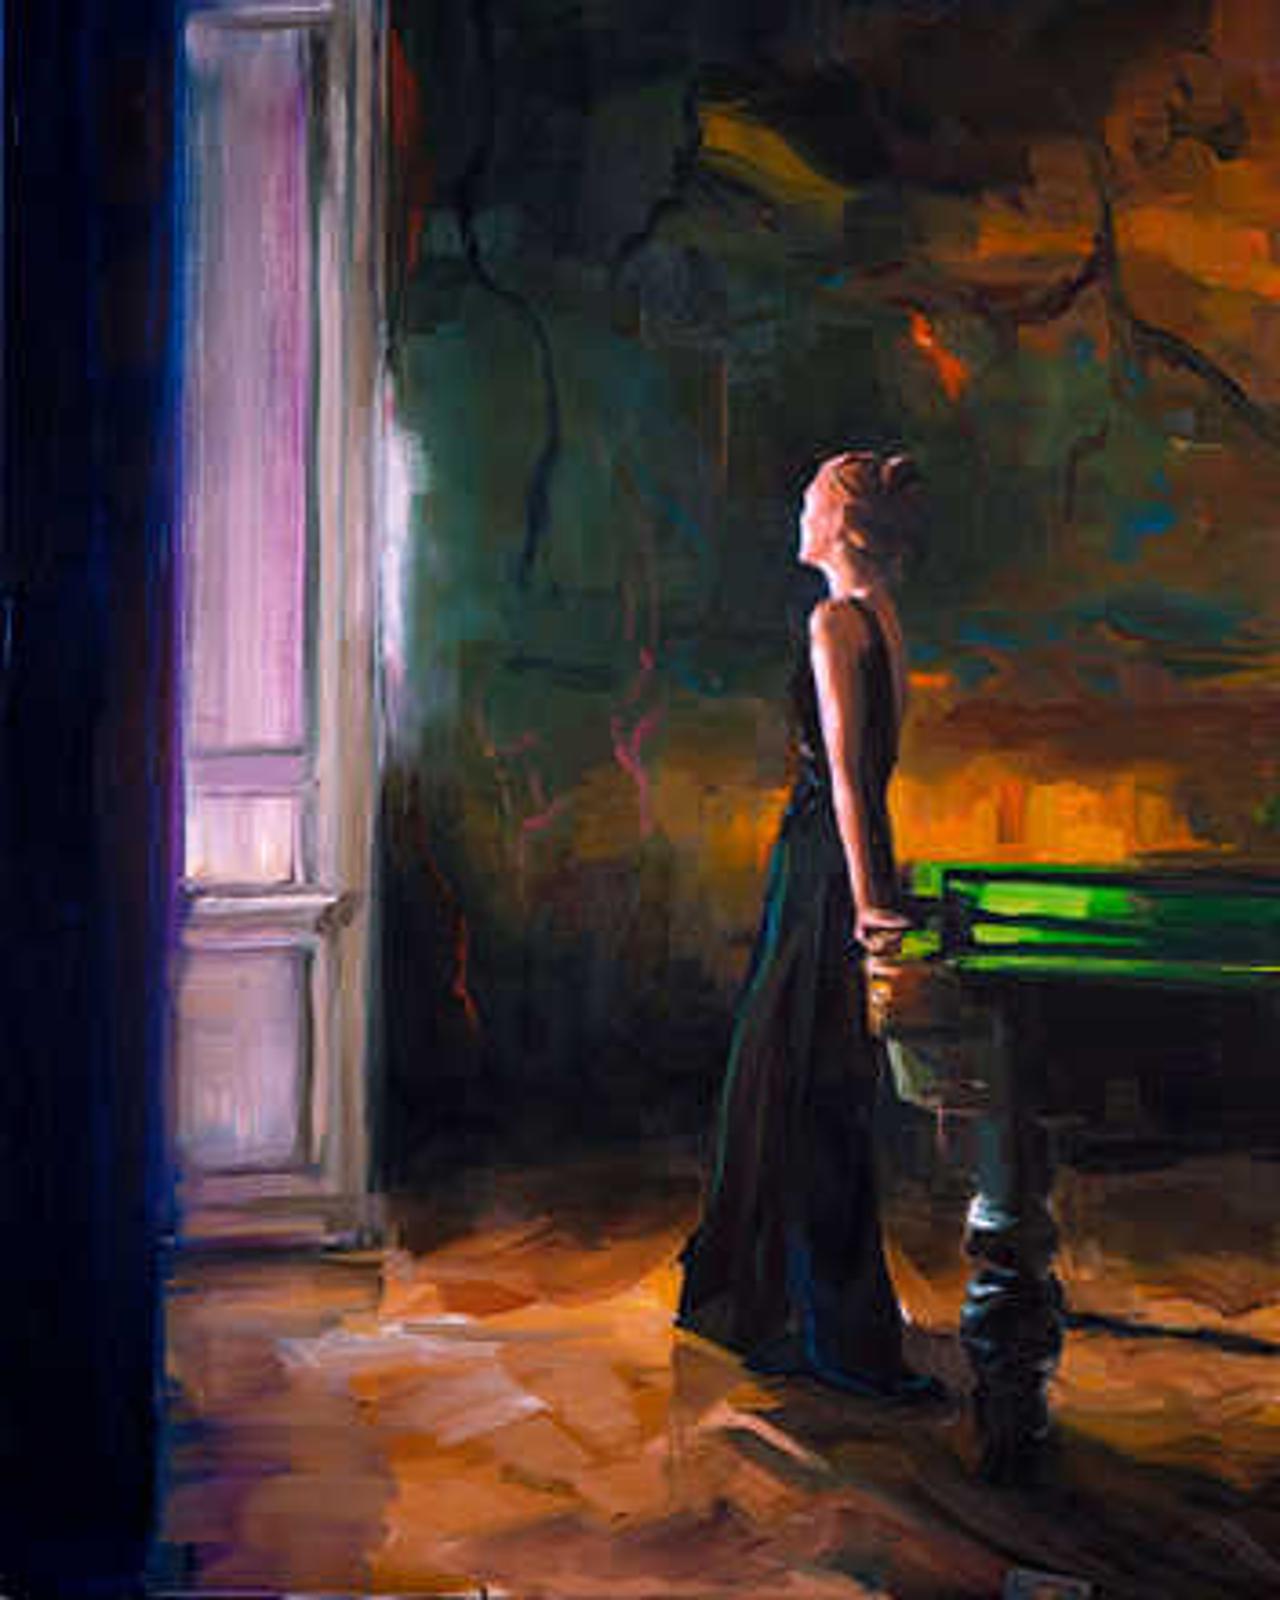 Belle Etage 1 - Edward B. Gordon